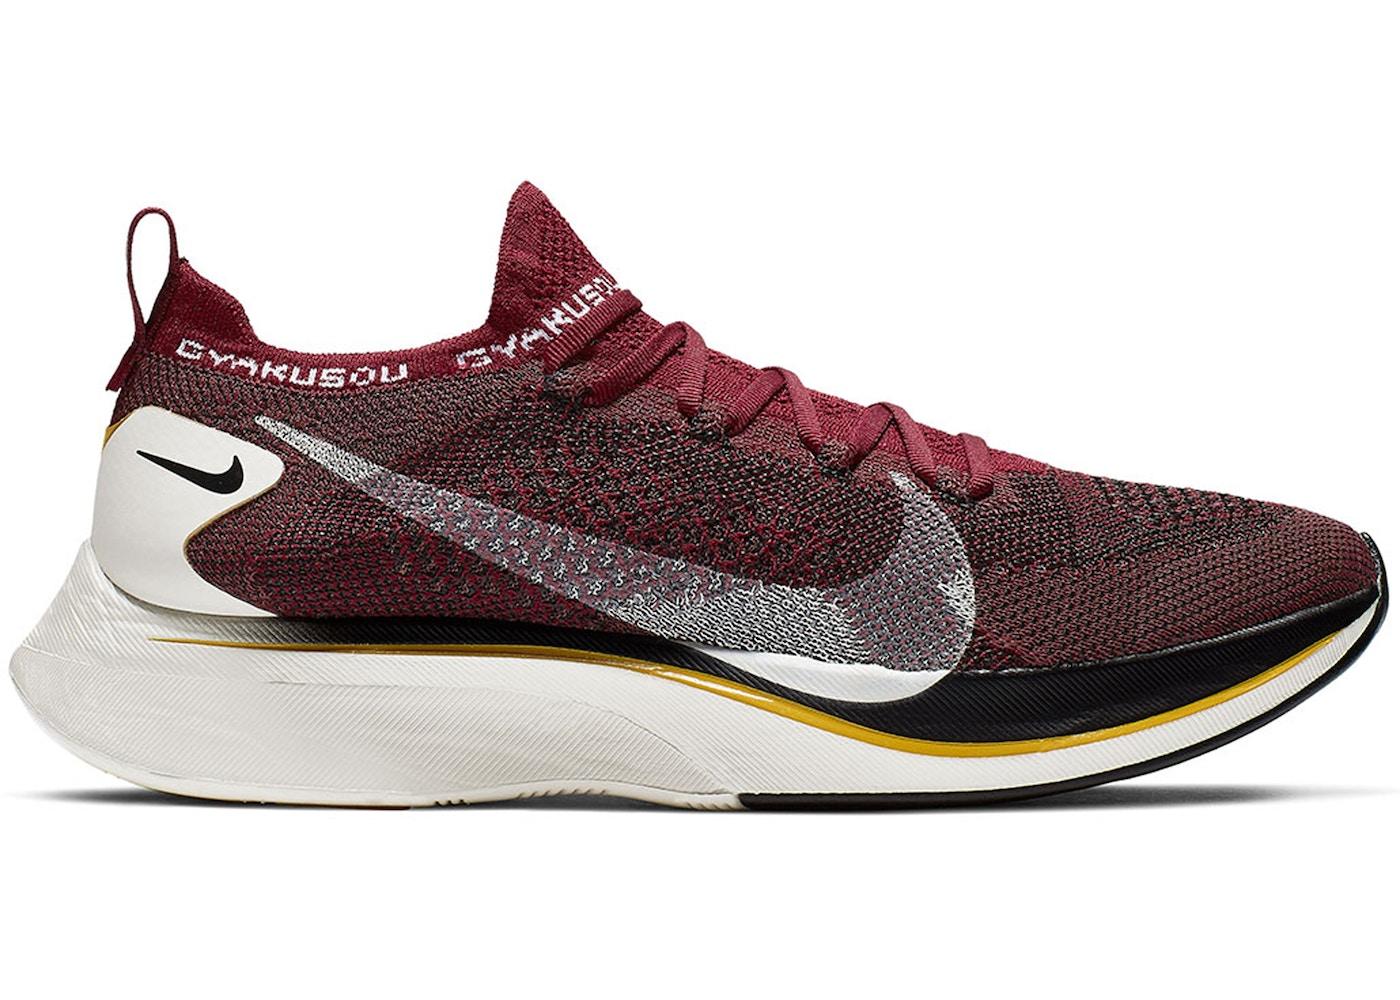 meet d35ab 7443c Nike VaporFly 4% Flyknit Gyakusou Team Red